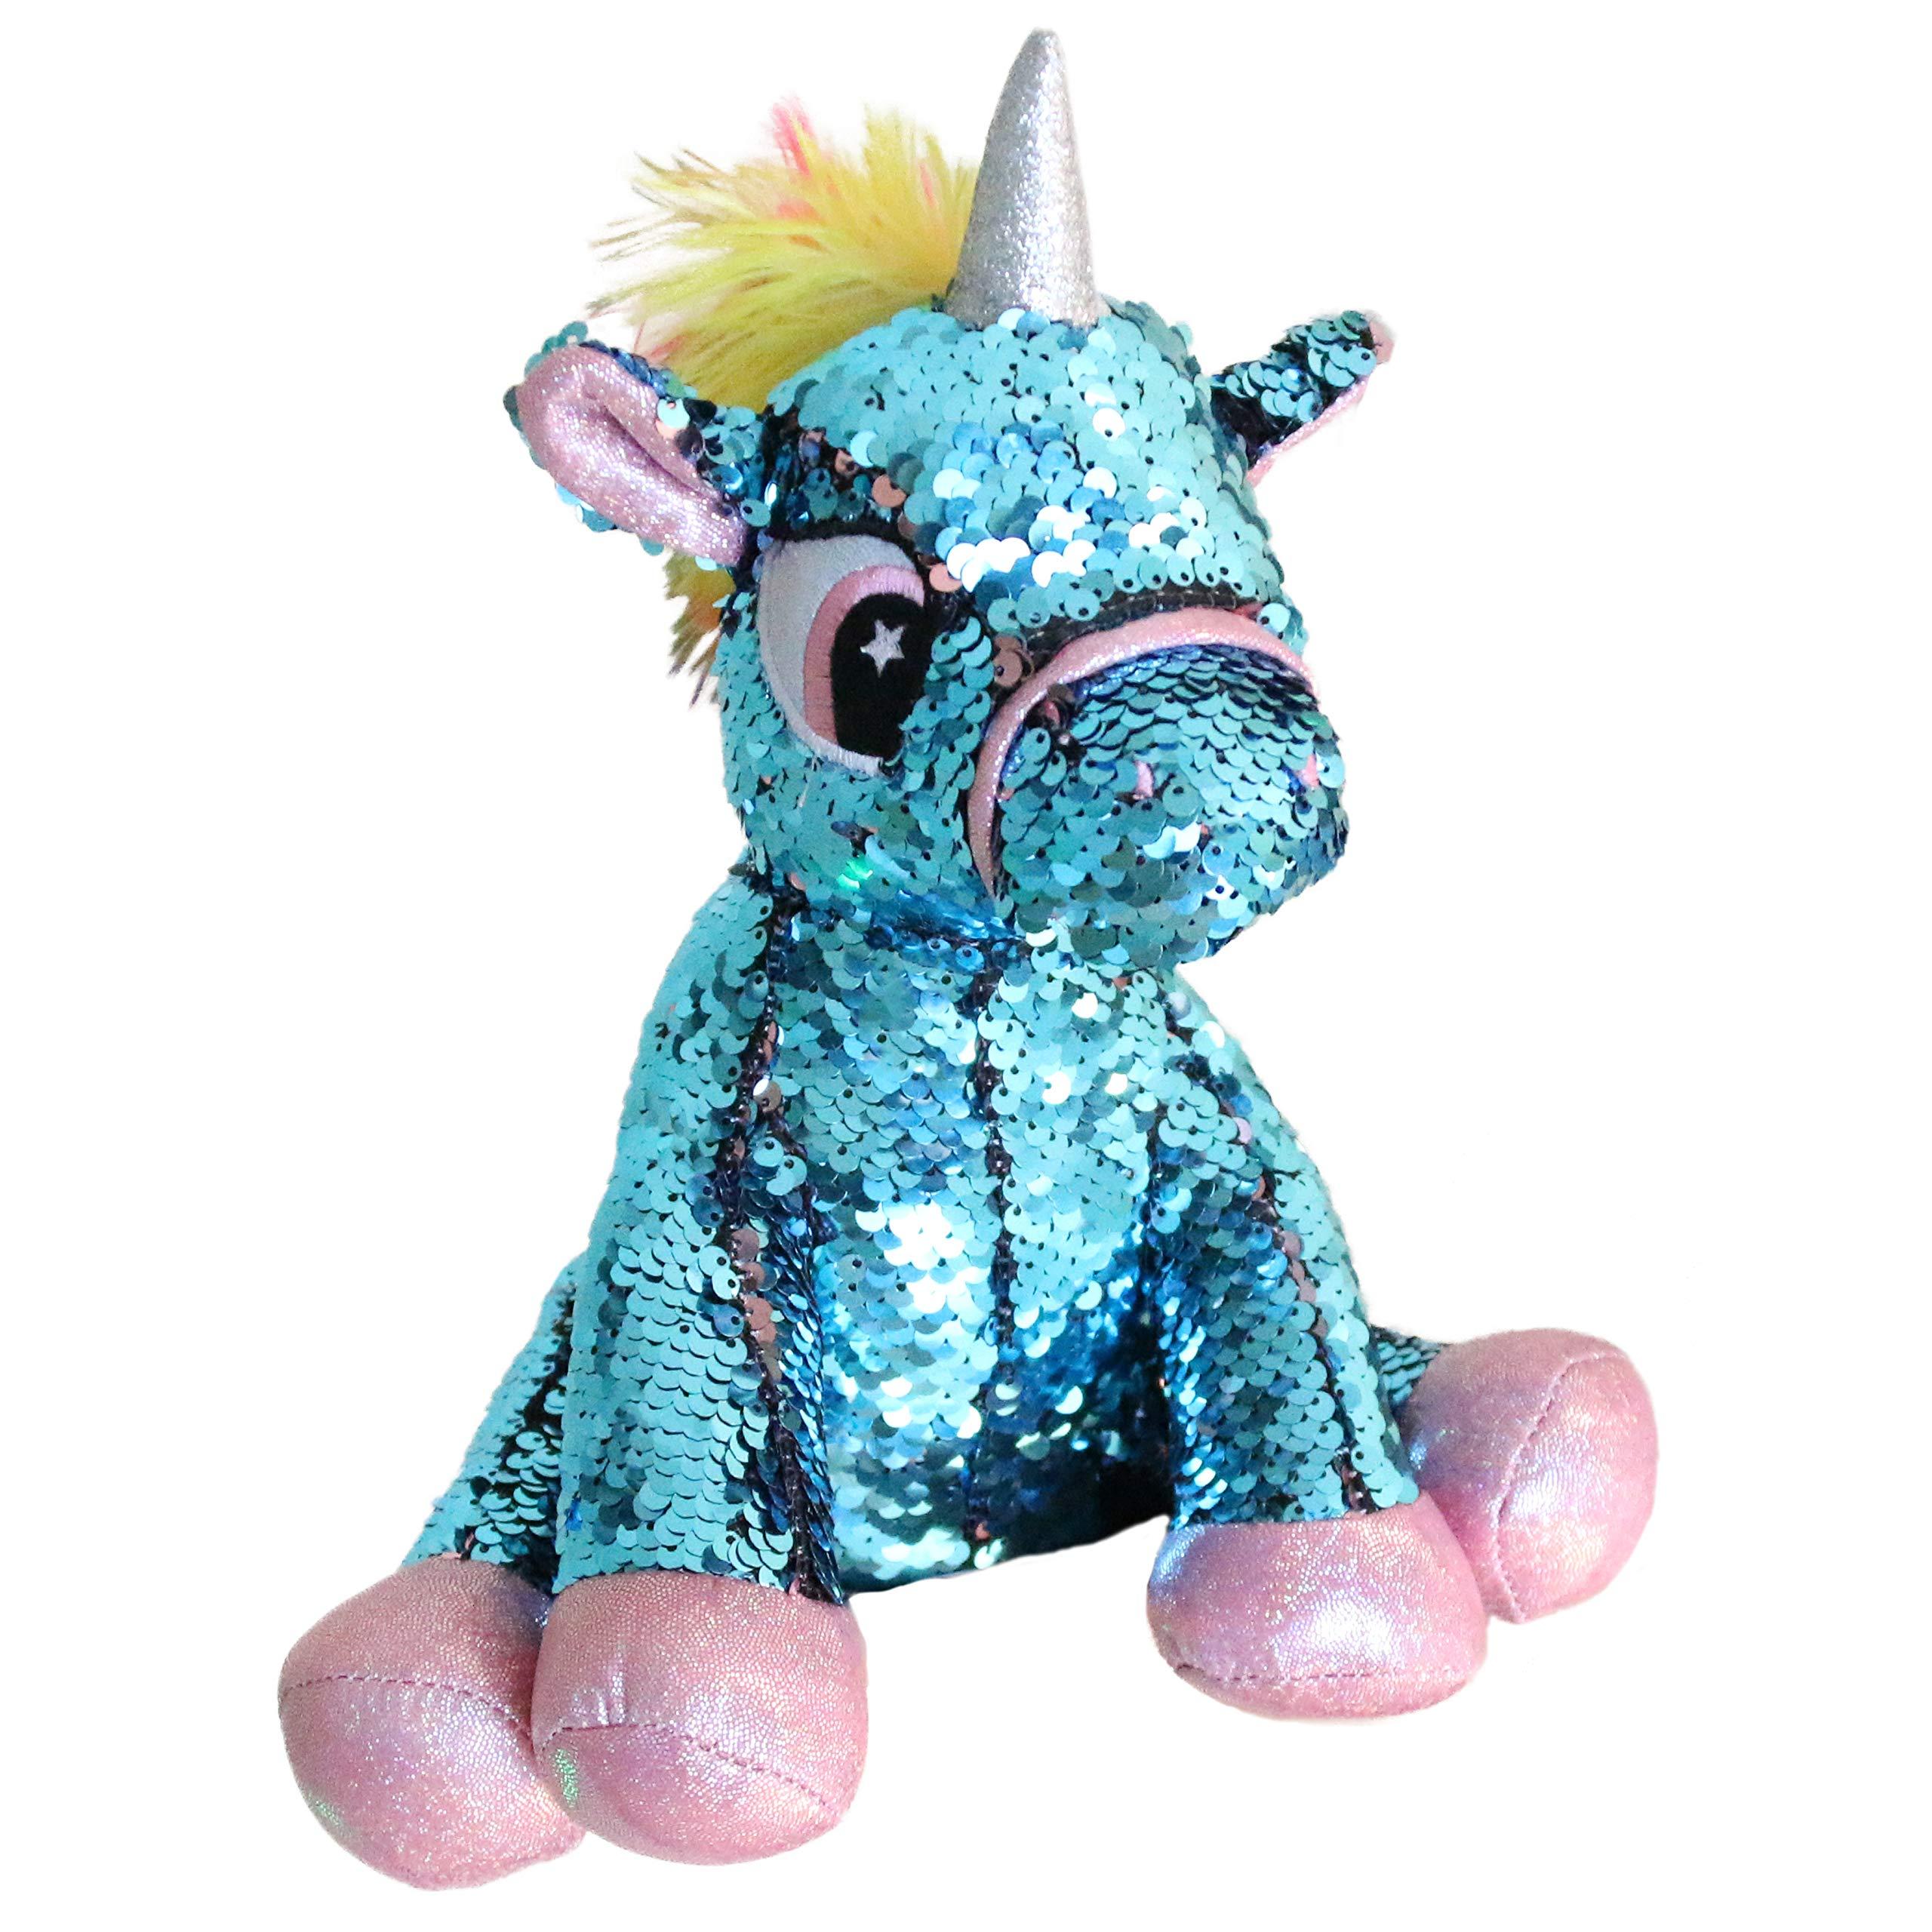 Athoinsu Flip Sequin Stuffed Animal Unicorn Plush Toy with Reversible Sequins Sparkle Birthday for Toddler Kids, Blue, 11''